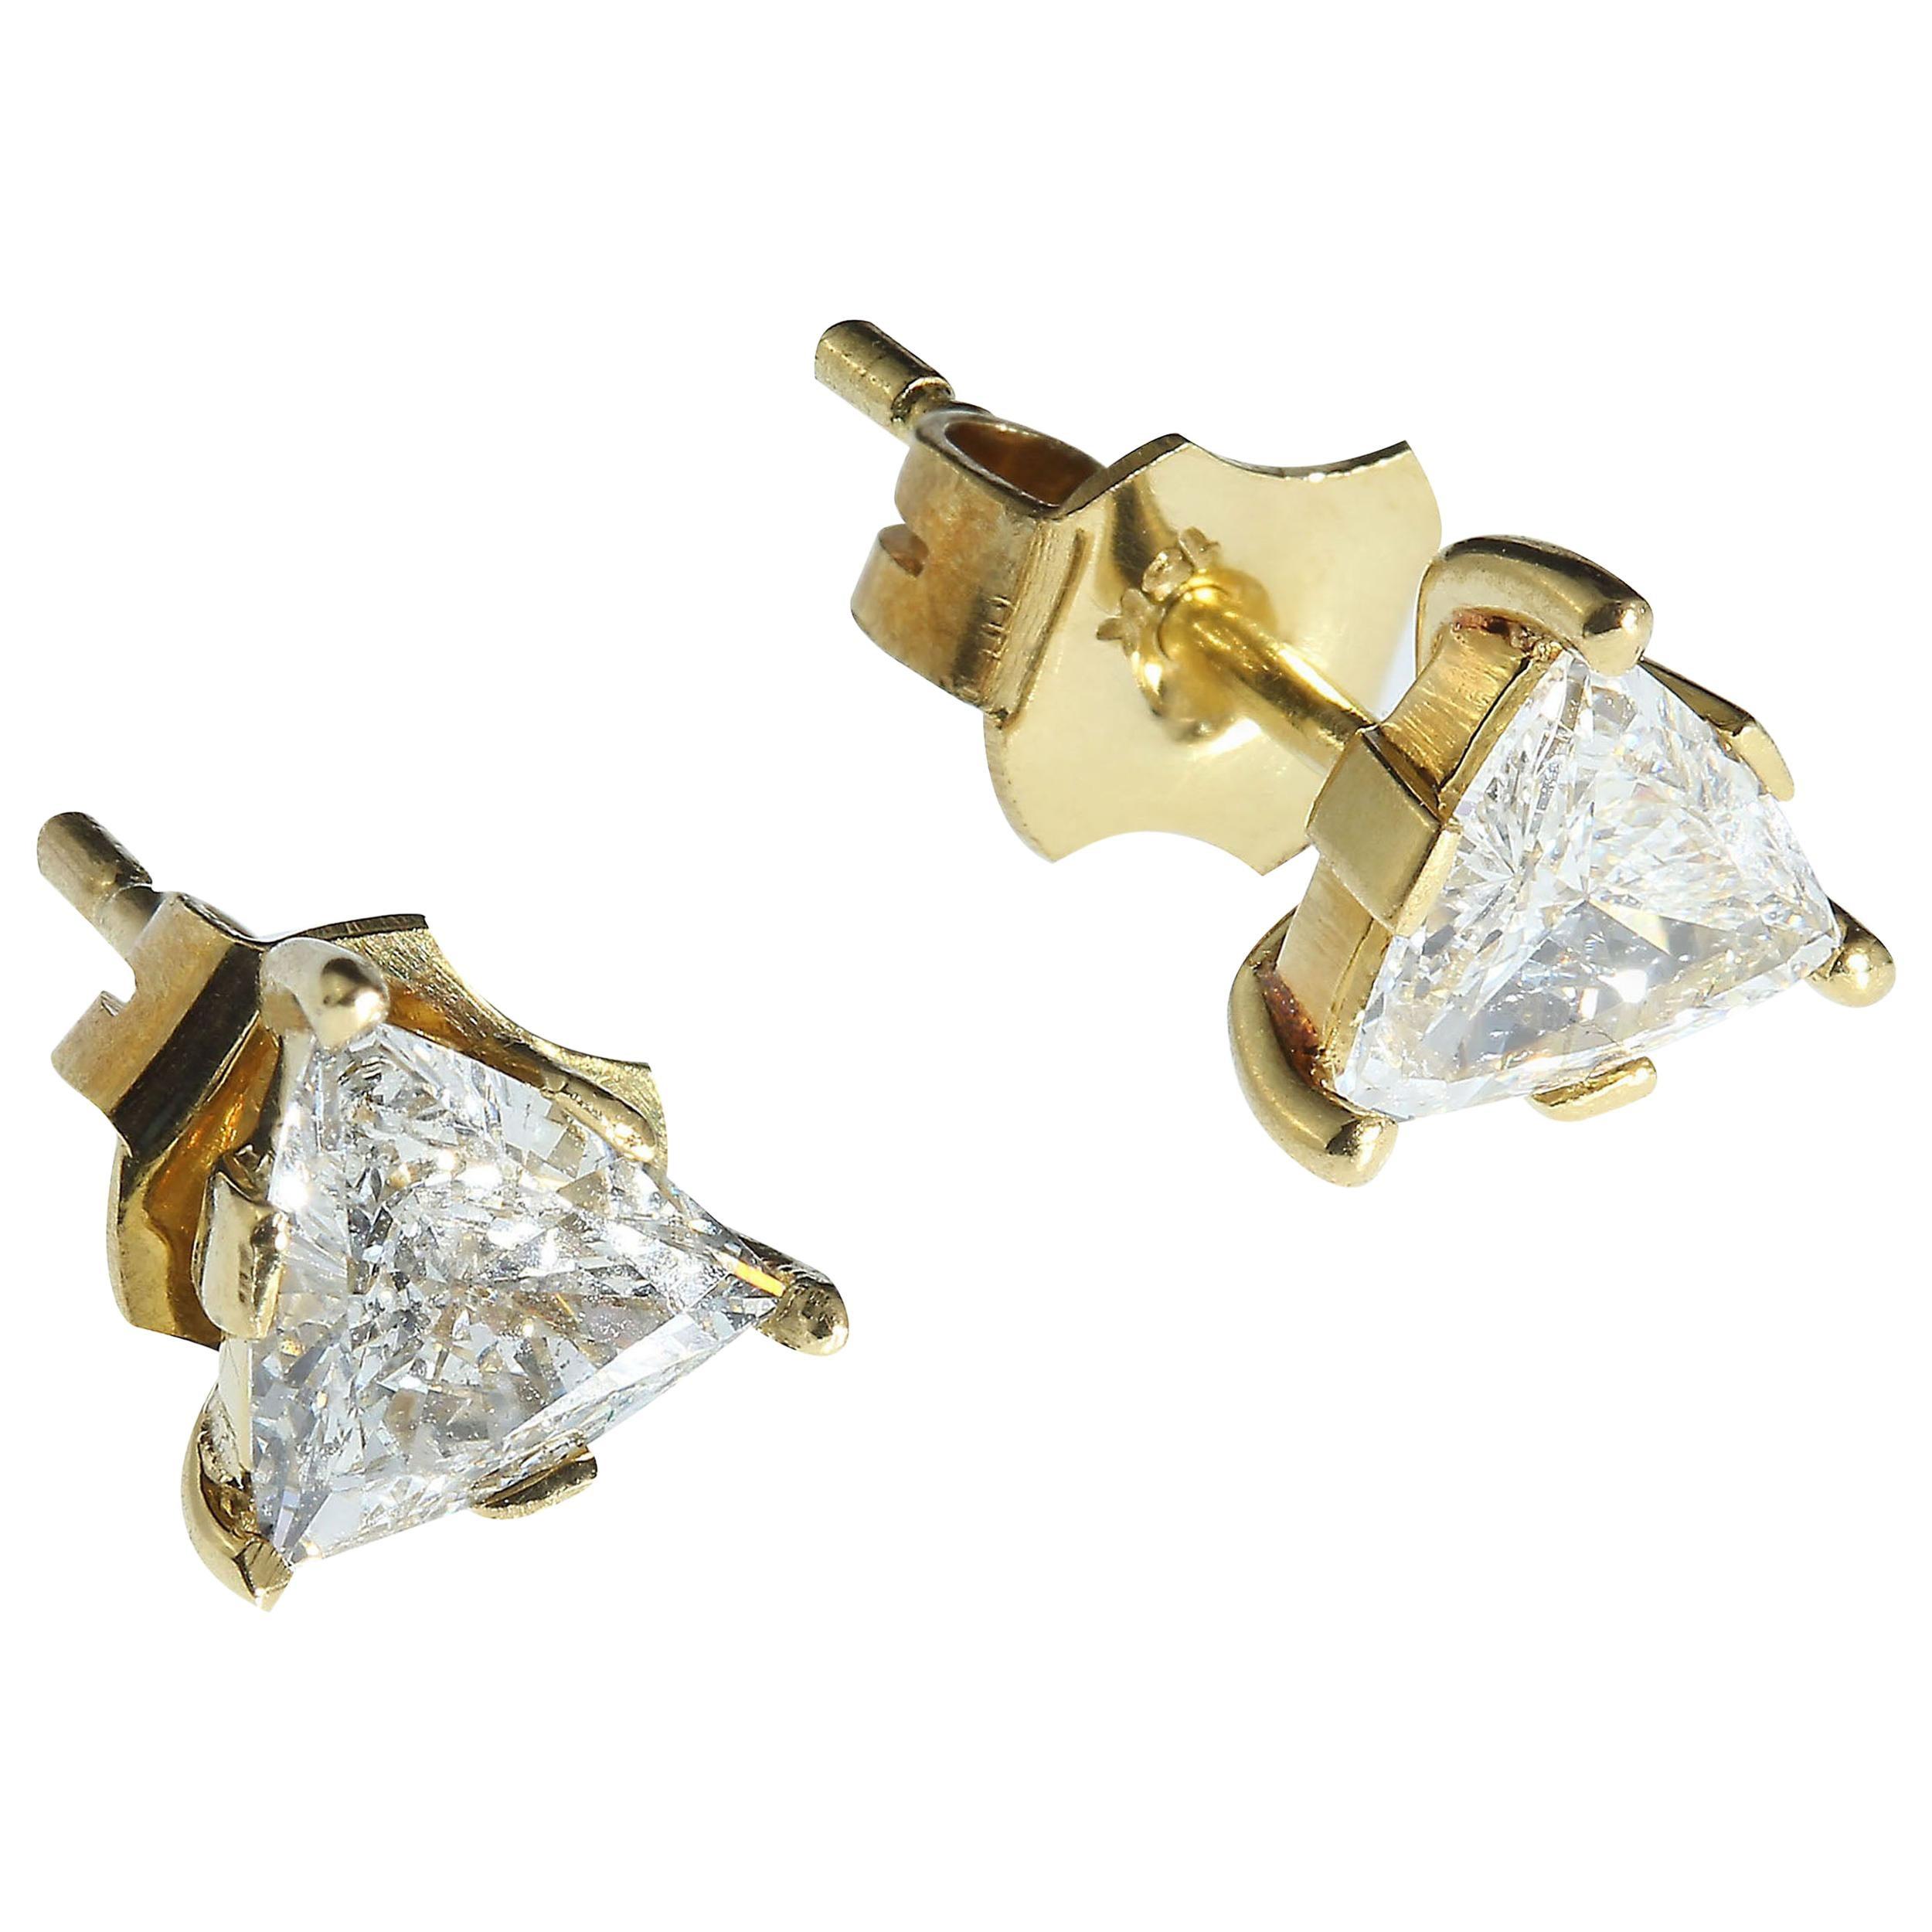 1.25 Carat Glittering Diamond Stud Earrings